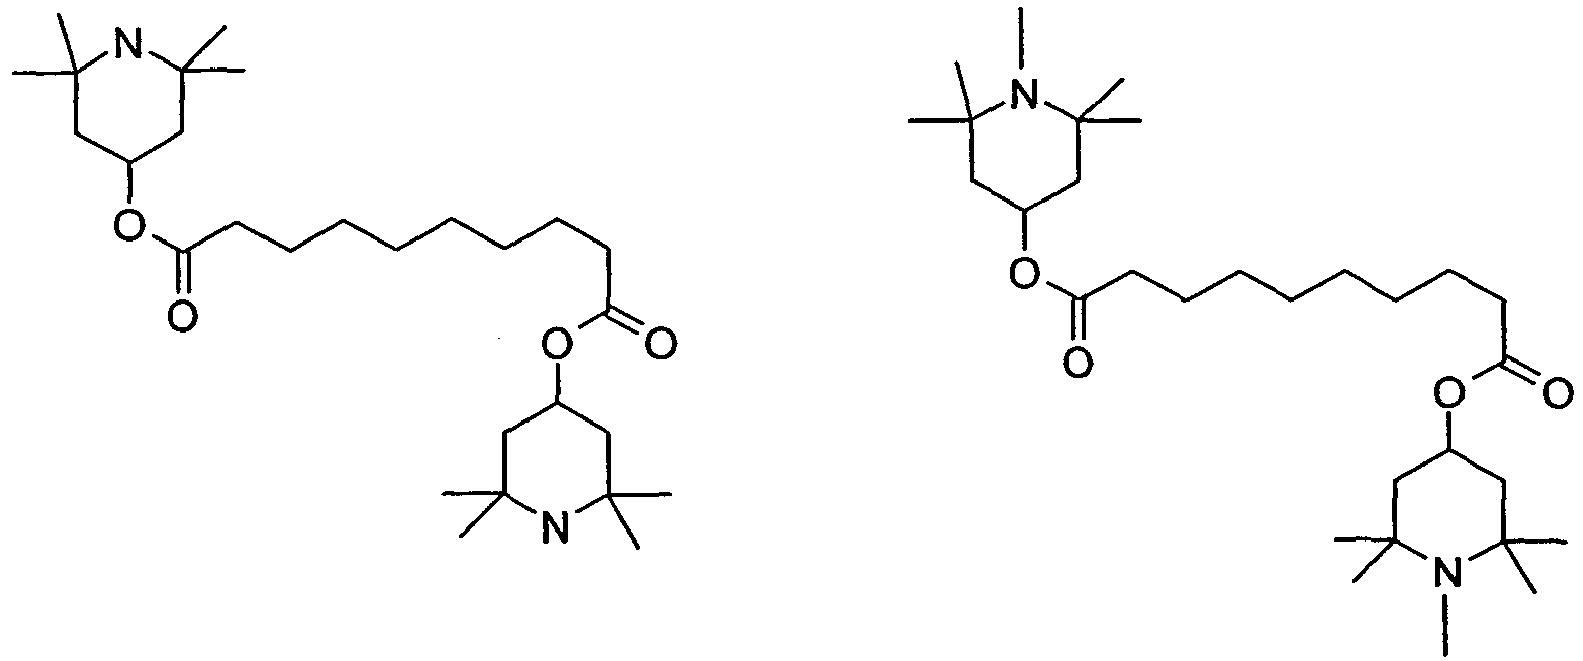 Figure imgb0606